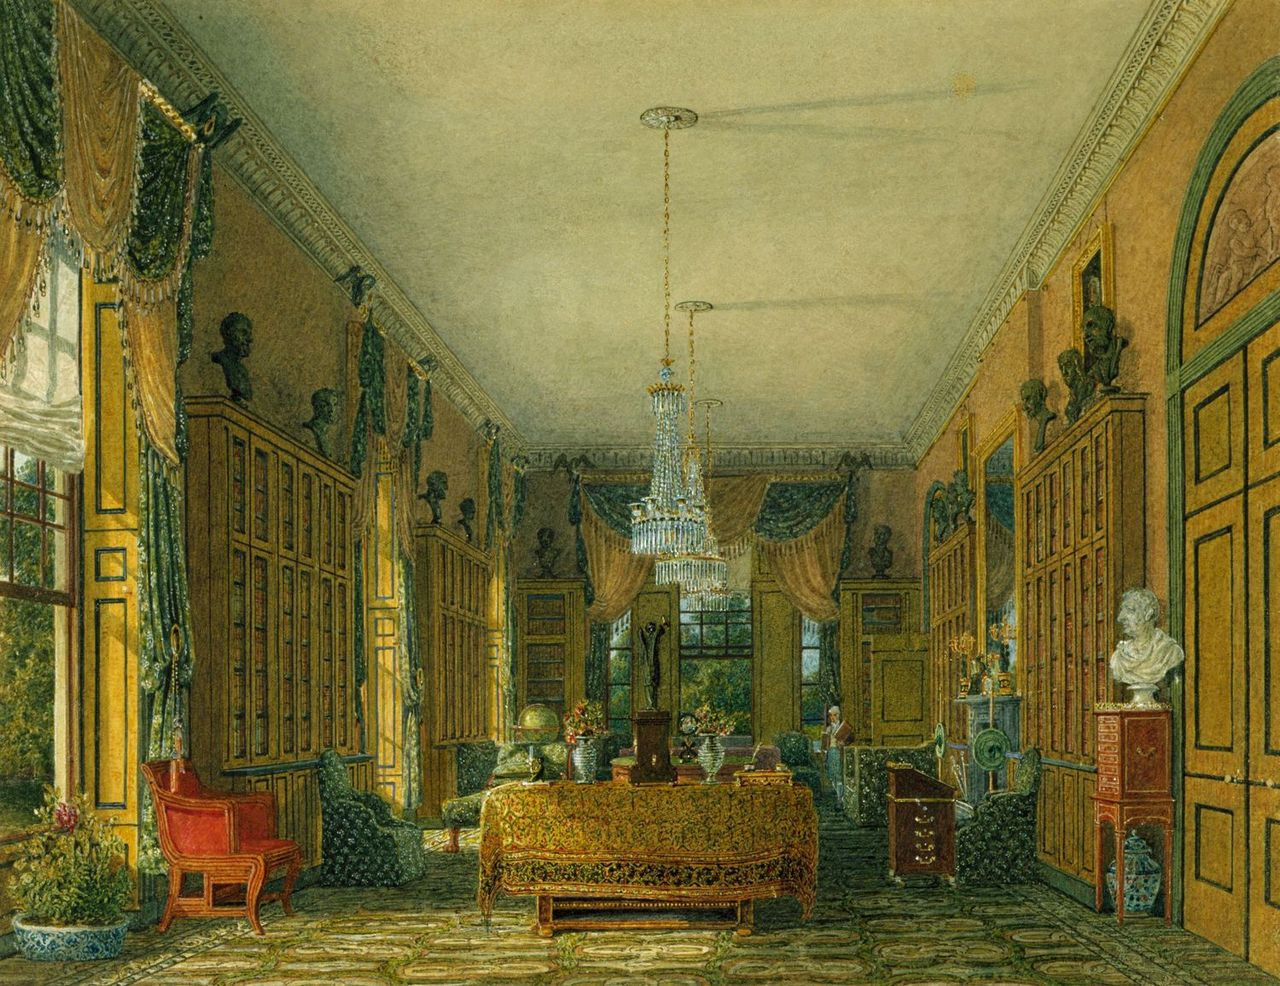 Фрогмор - Хаус, Королевская библиотека, Чарльз Уайлд, 1817- royal coll 922120 257041 ORI 0 0.jpg